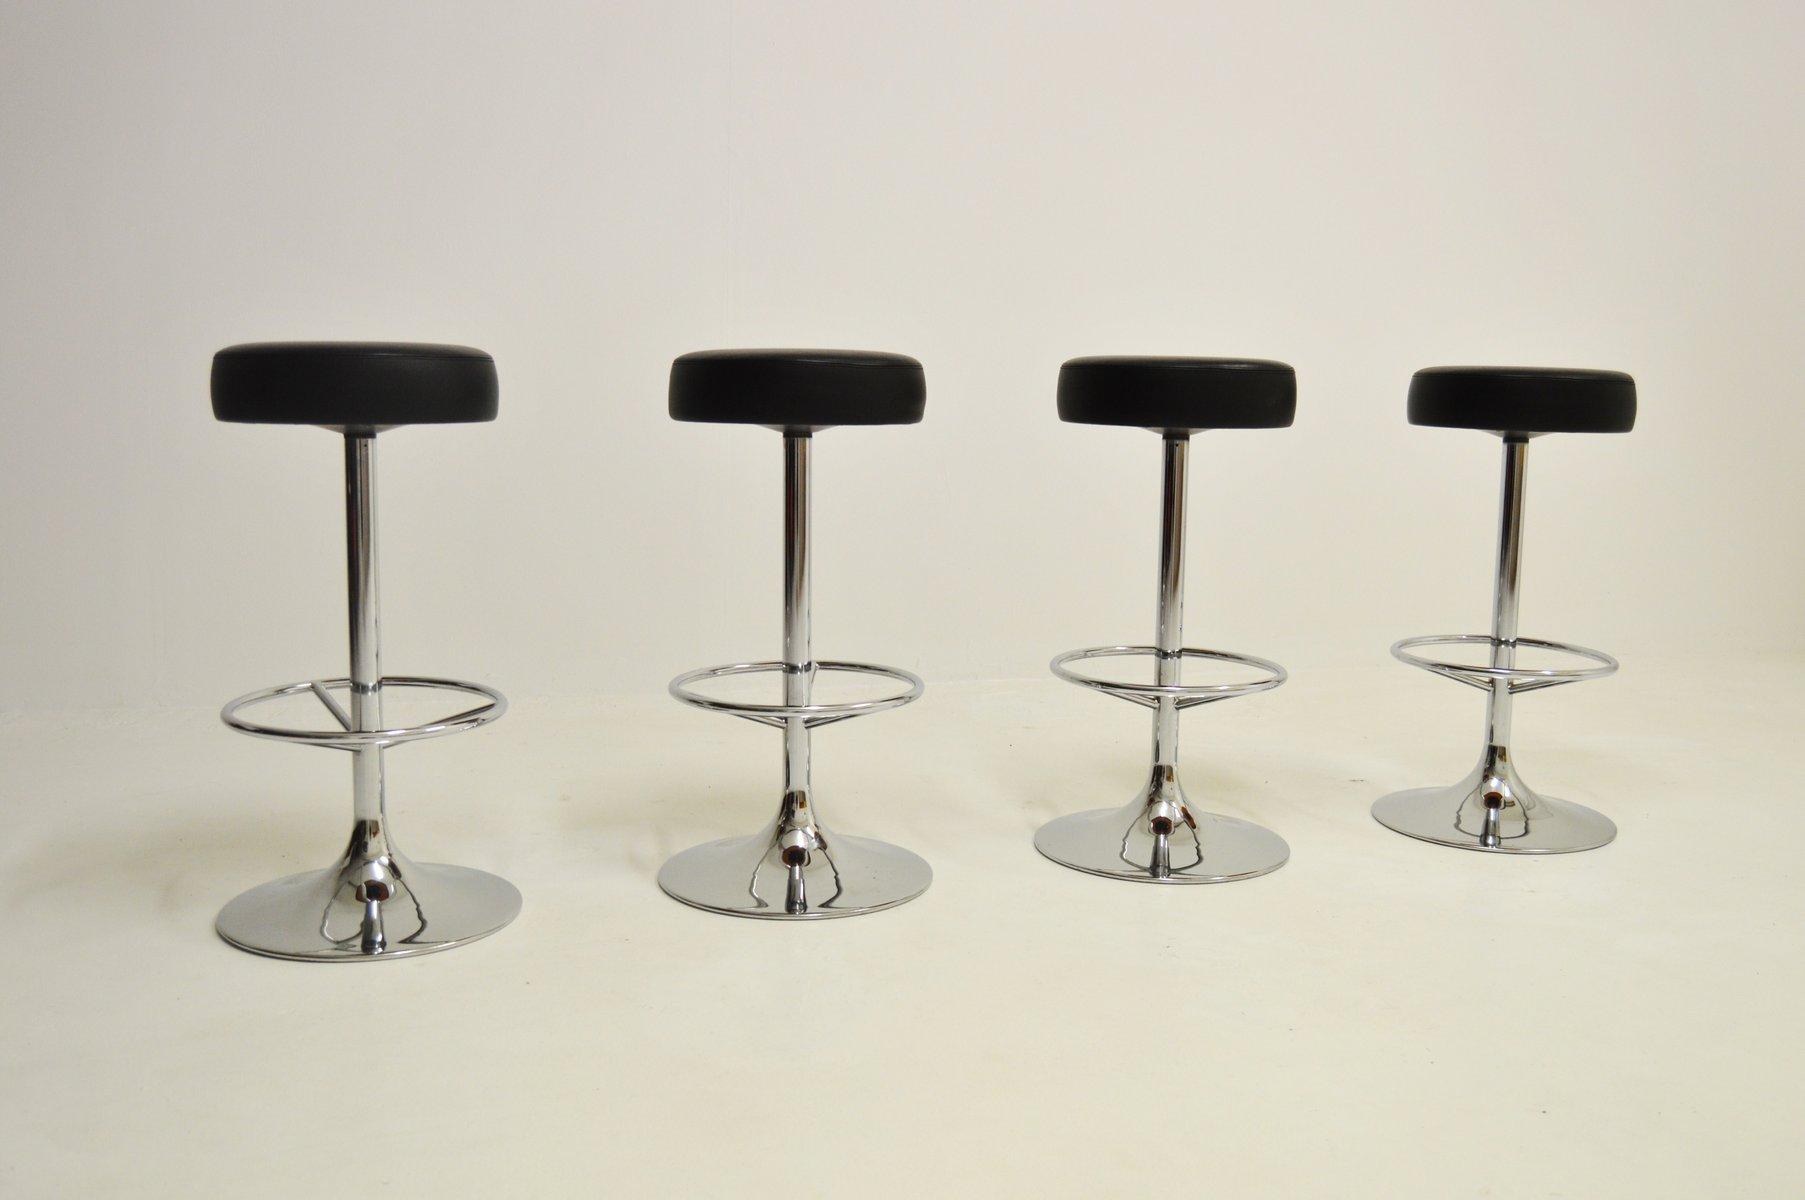 Barhocker Design verchromte vintage barhocker johansson design 4er set bei